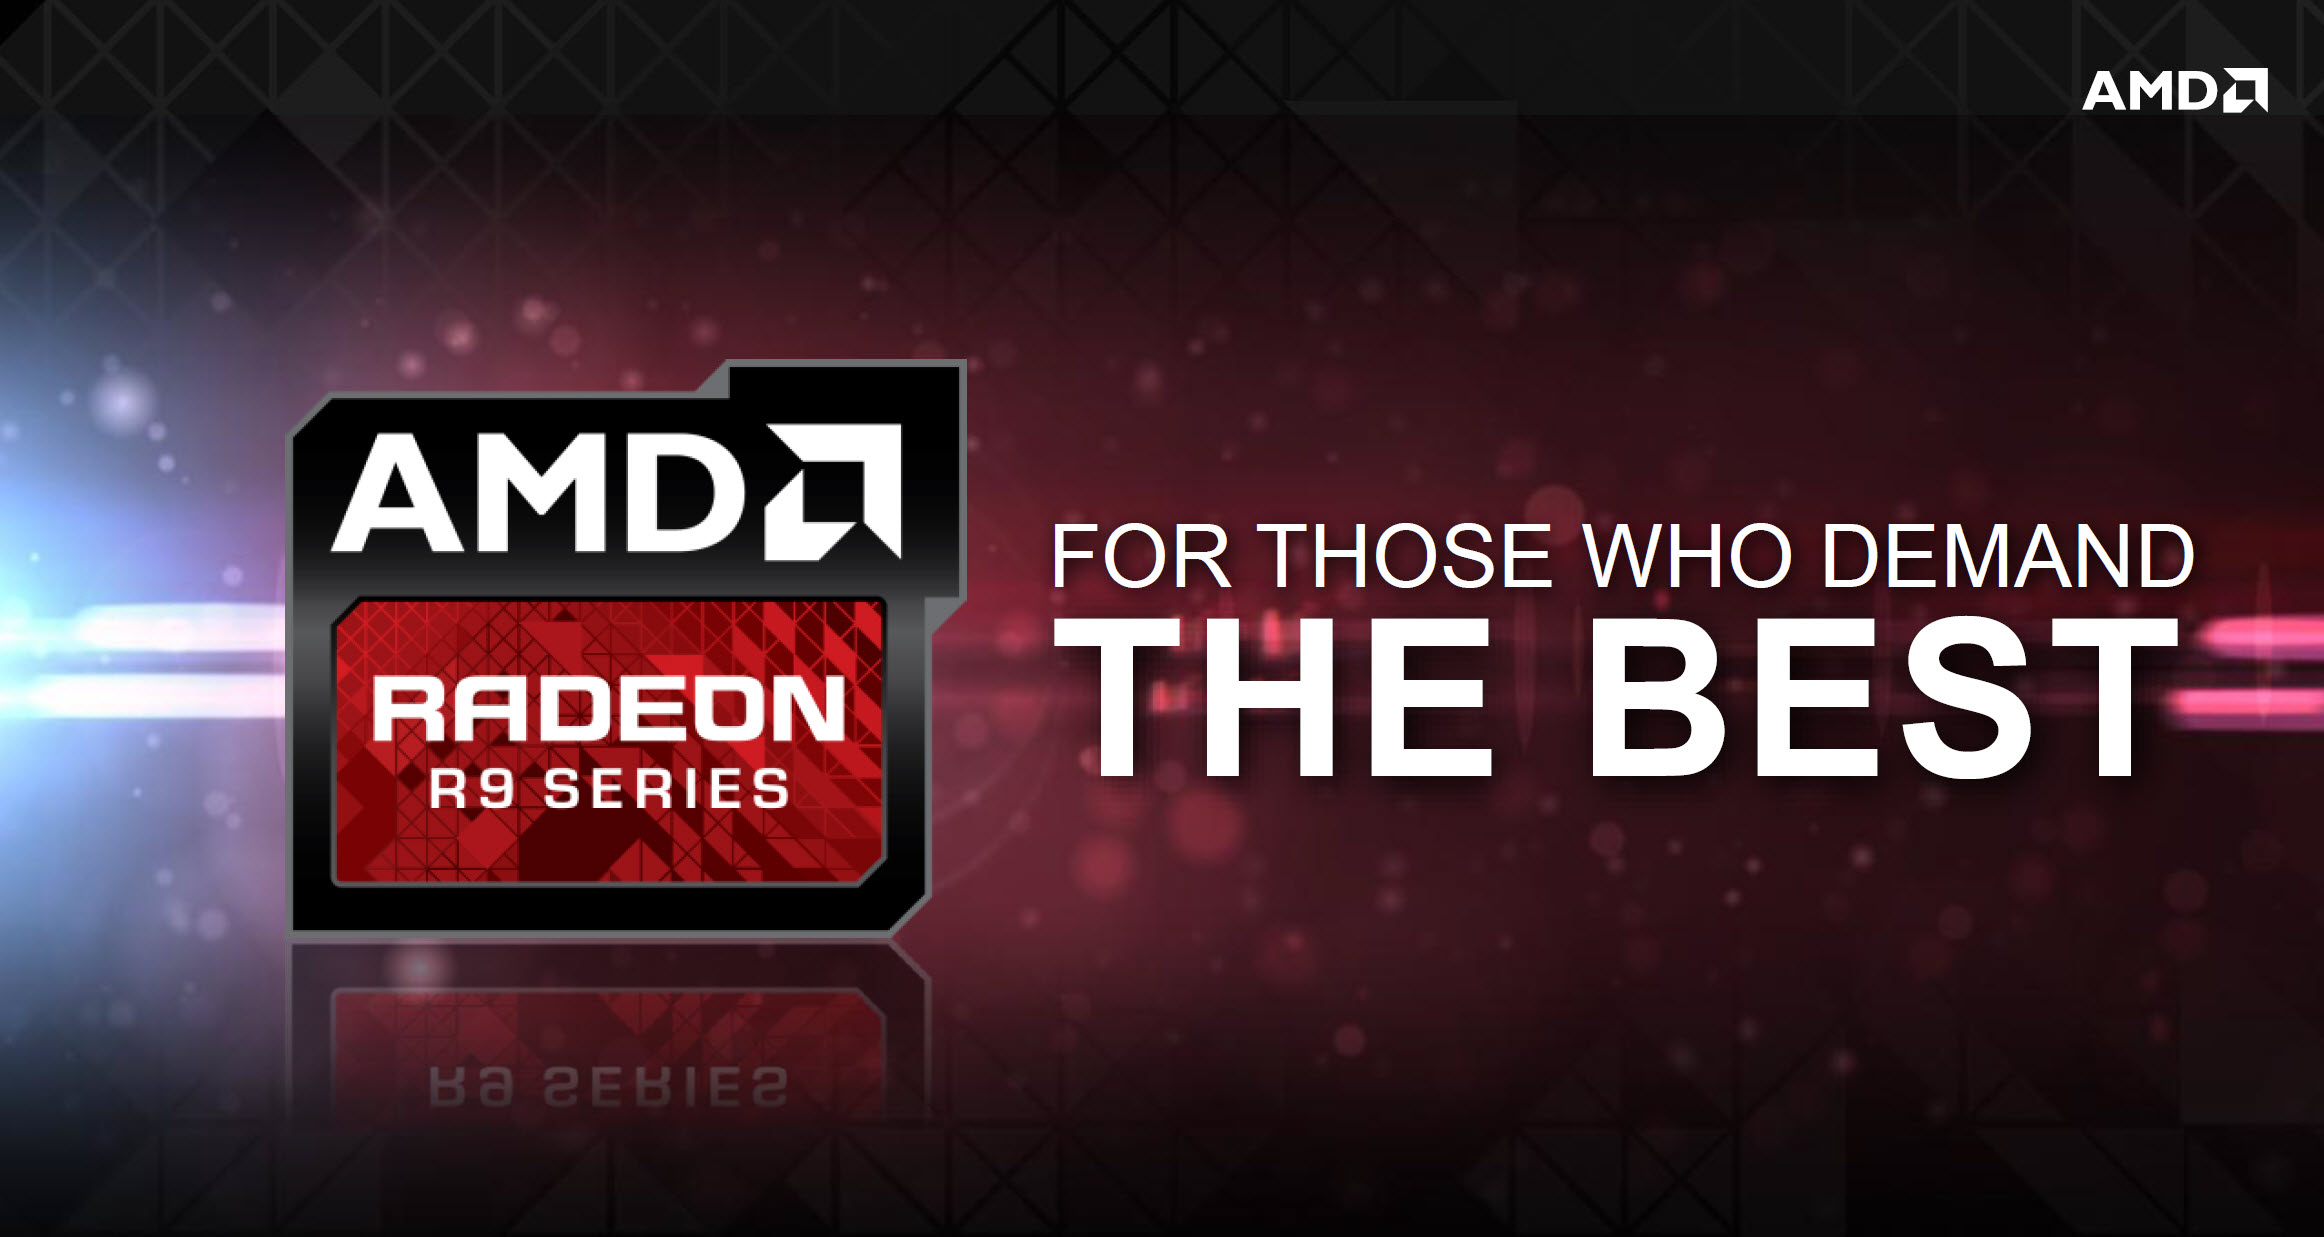 I can t install AMD radeon R9 Mx driver